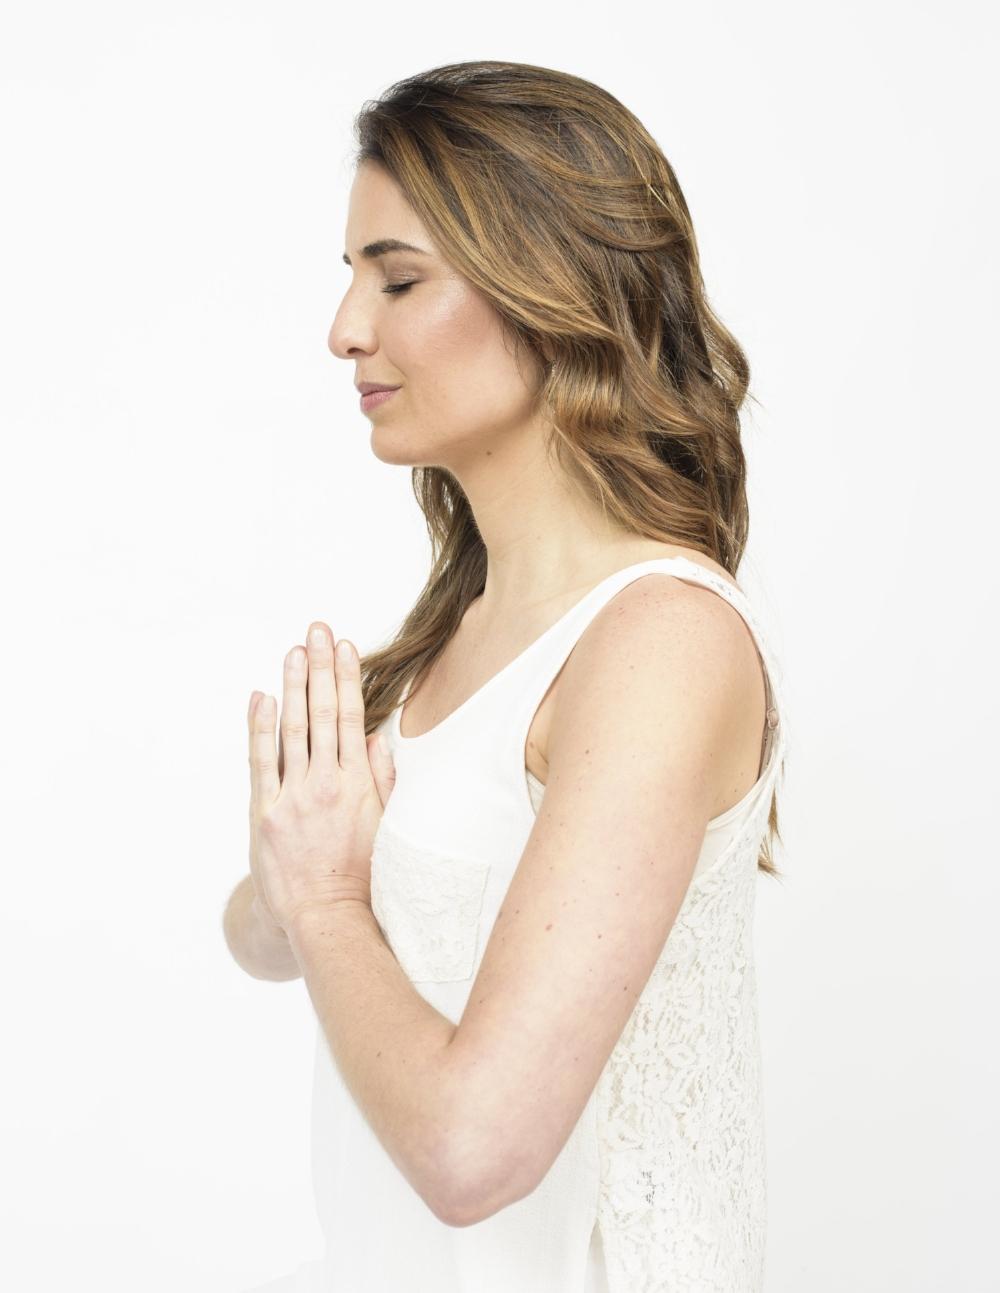 Amanda_meditation teacher_soulstice mind body spa.jpg